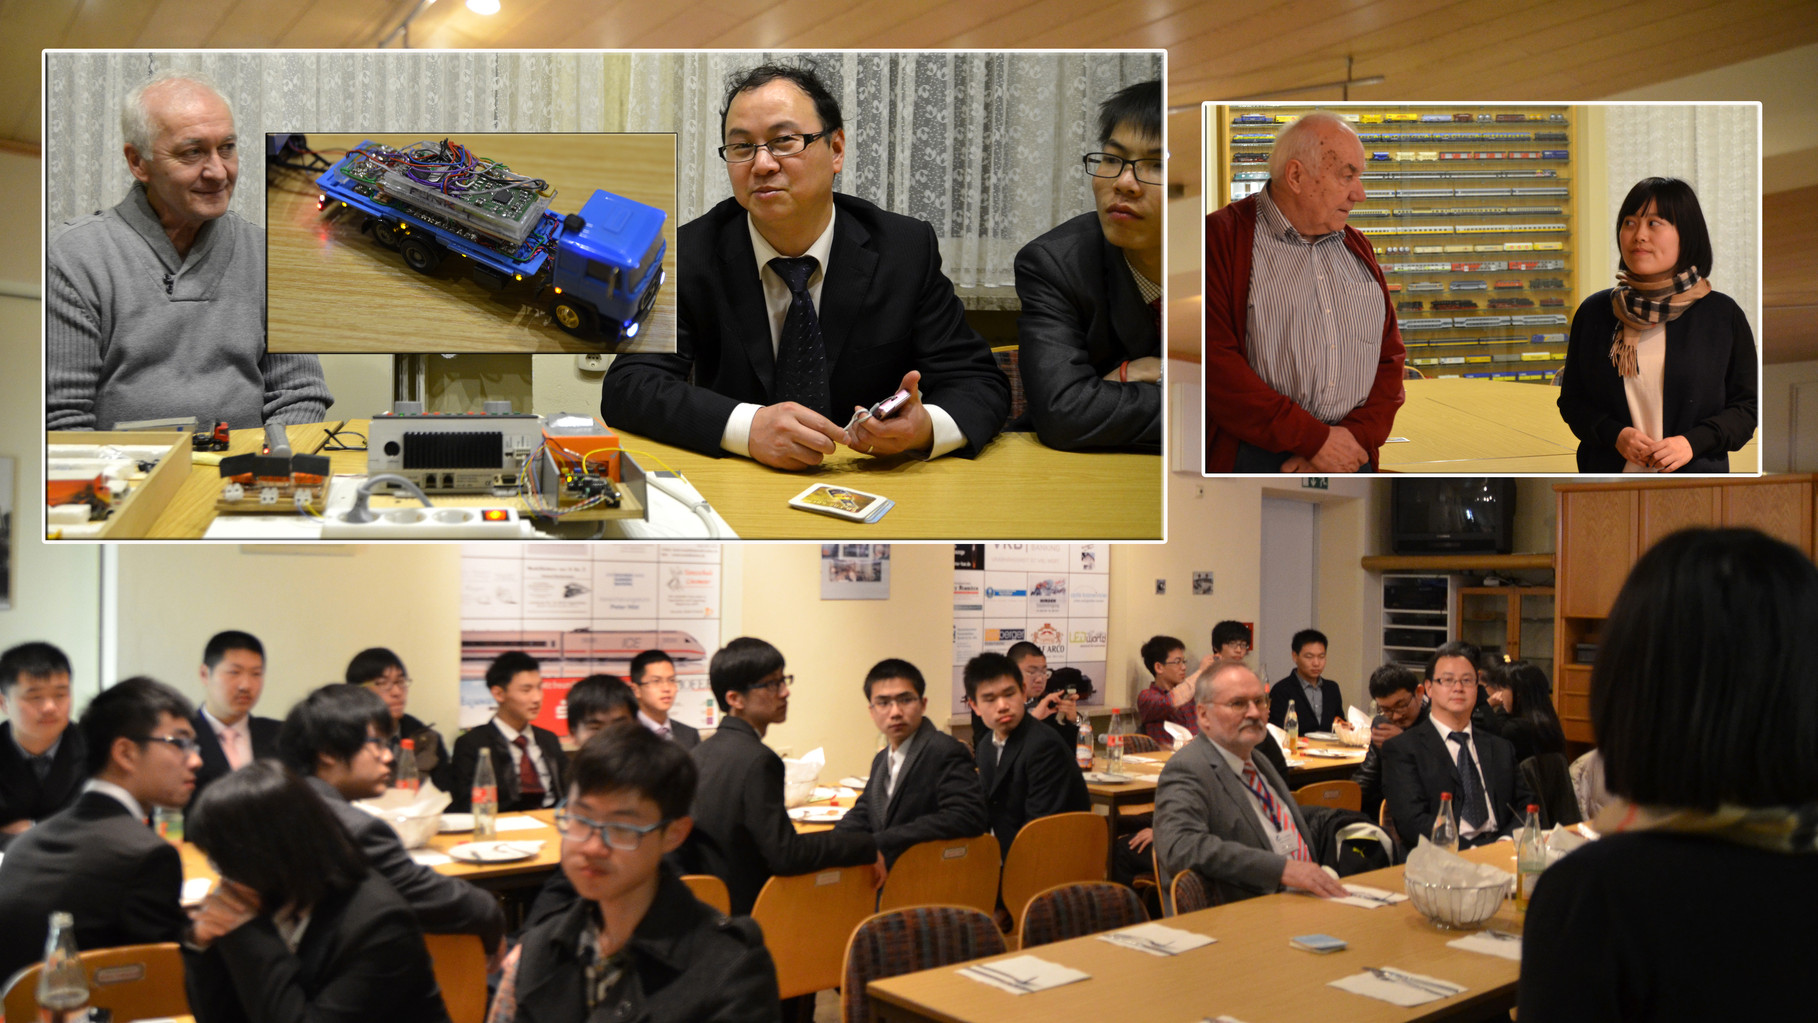 19.02.2014: 36-köpfige Delegation vom BBZ Shanghai besucht den MEC